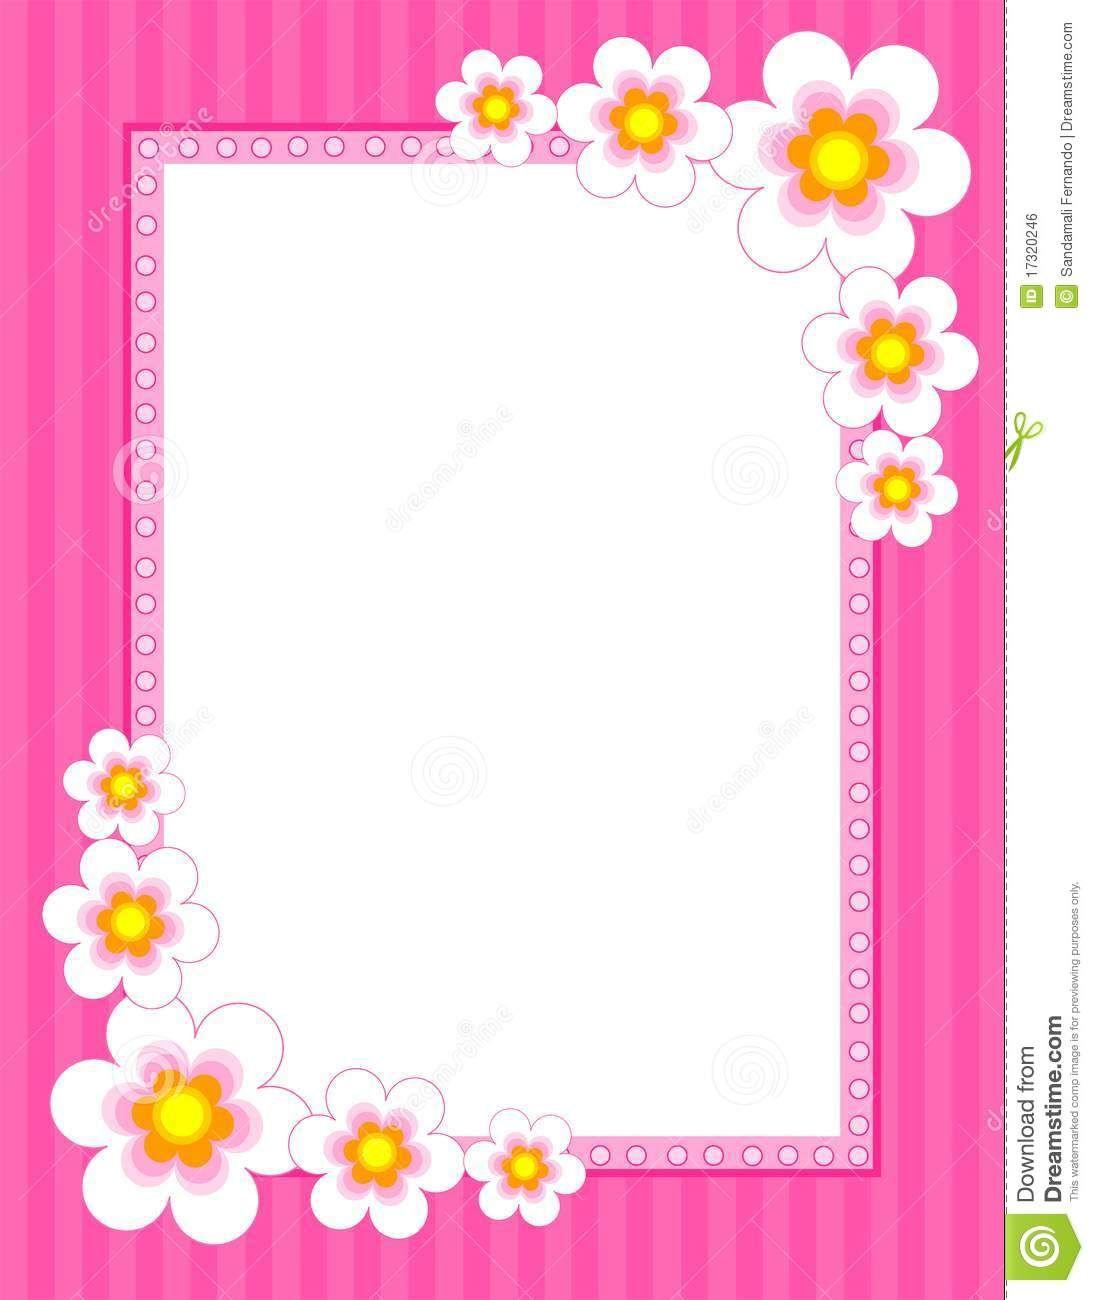 pretty pink border floral - photo #38